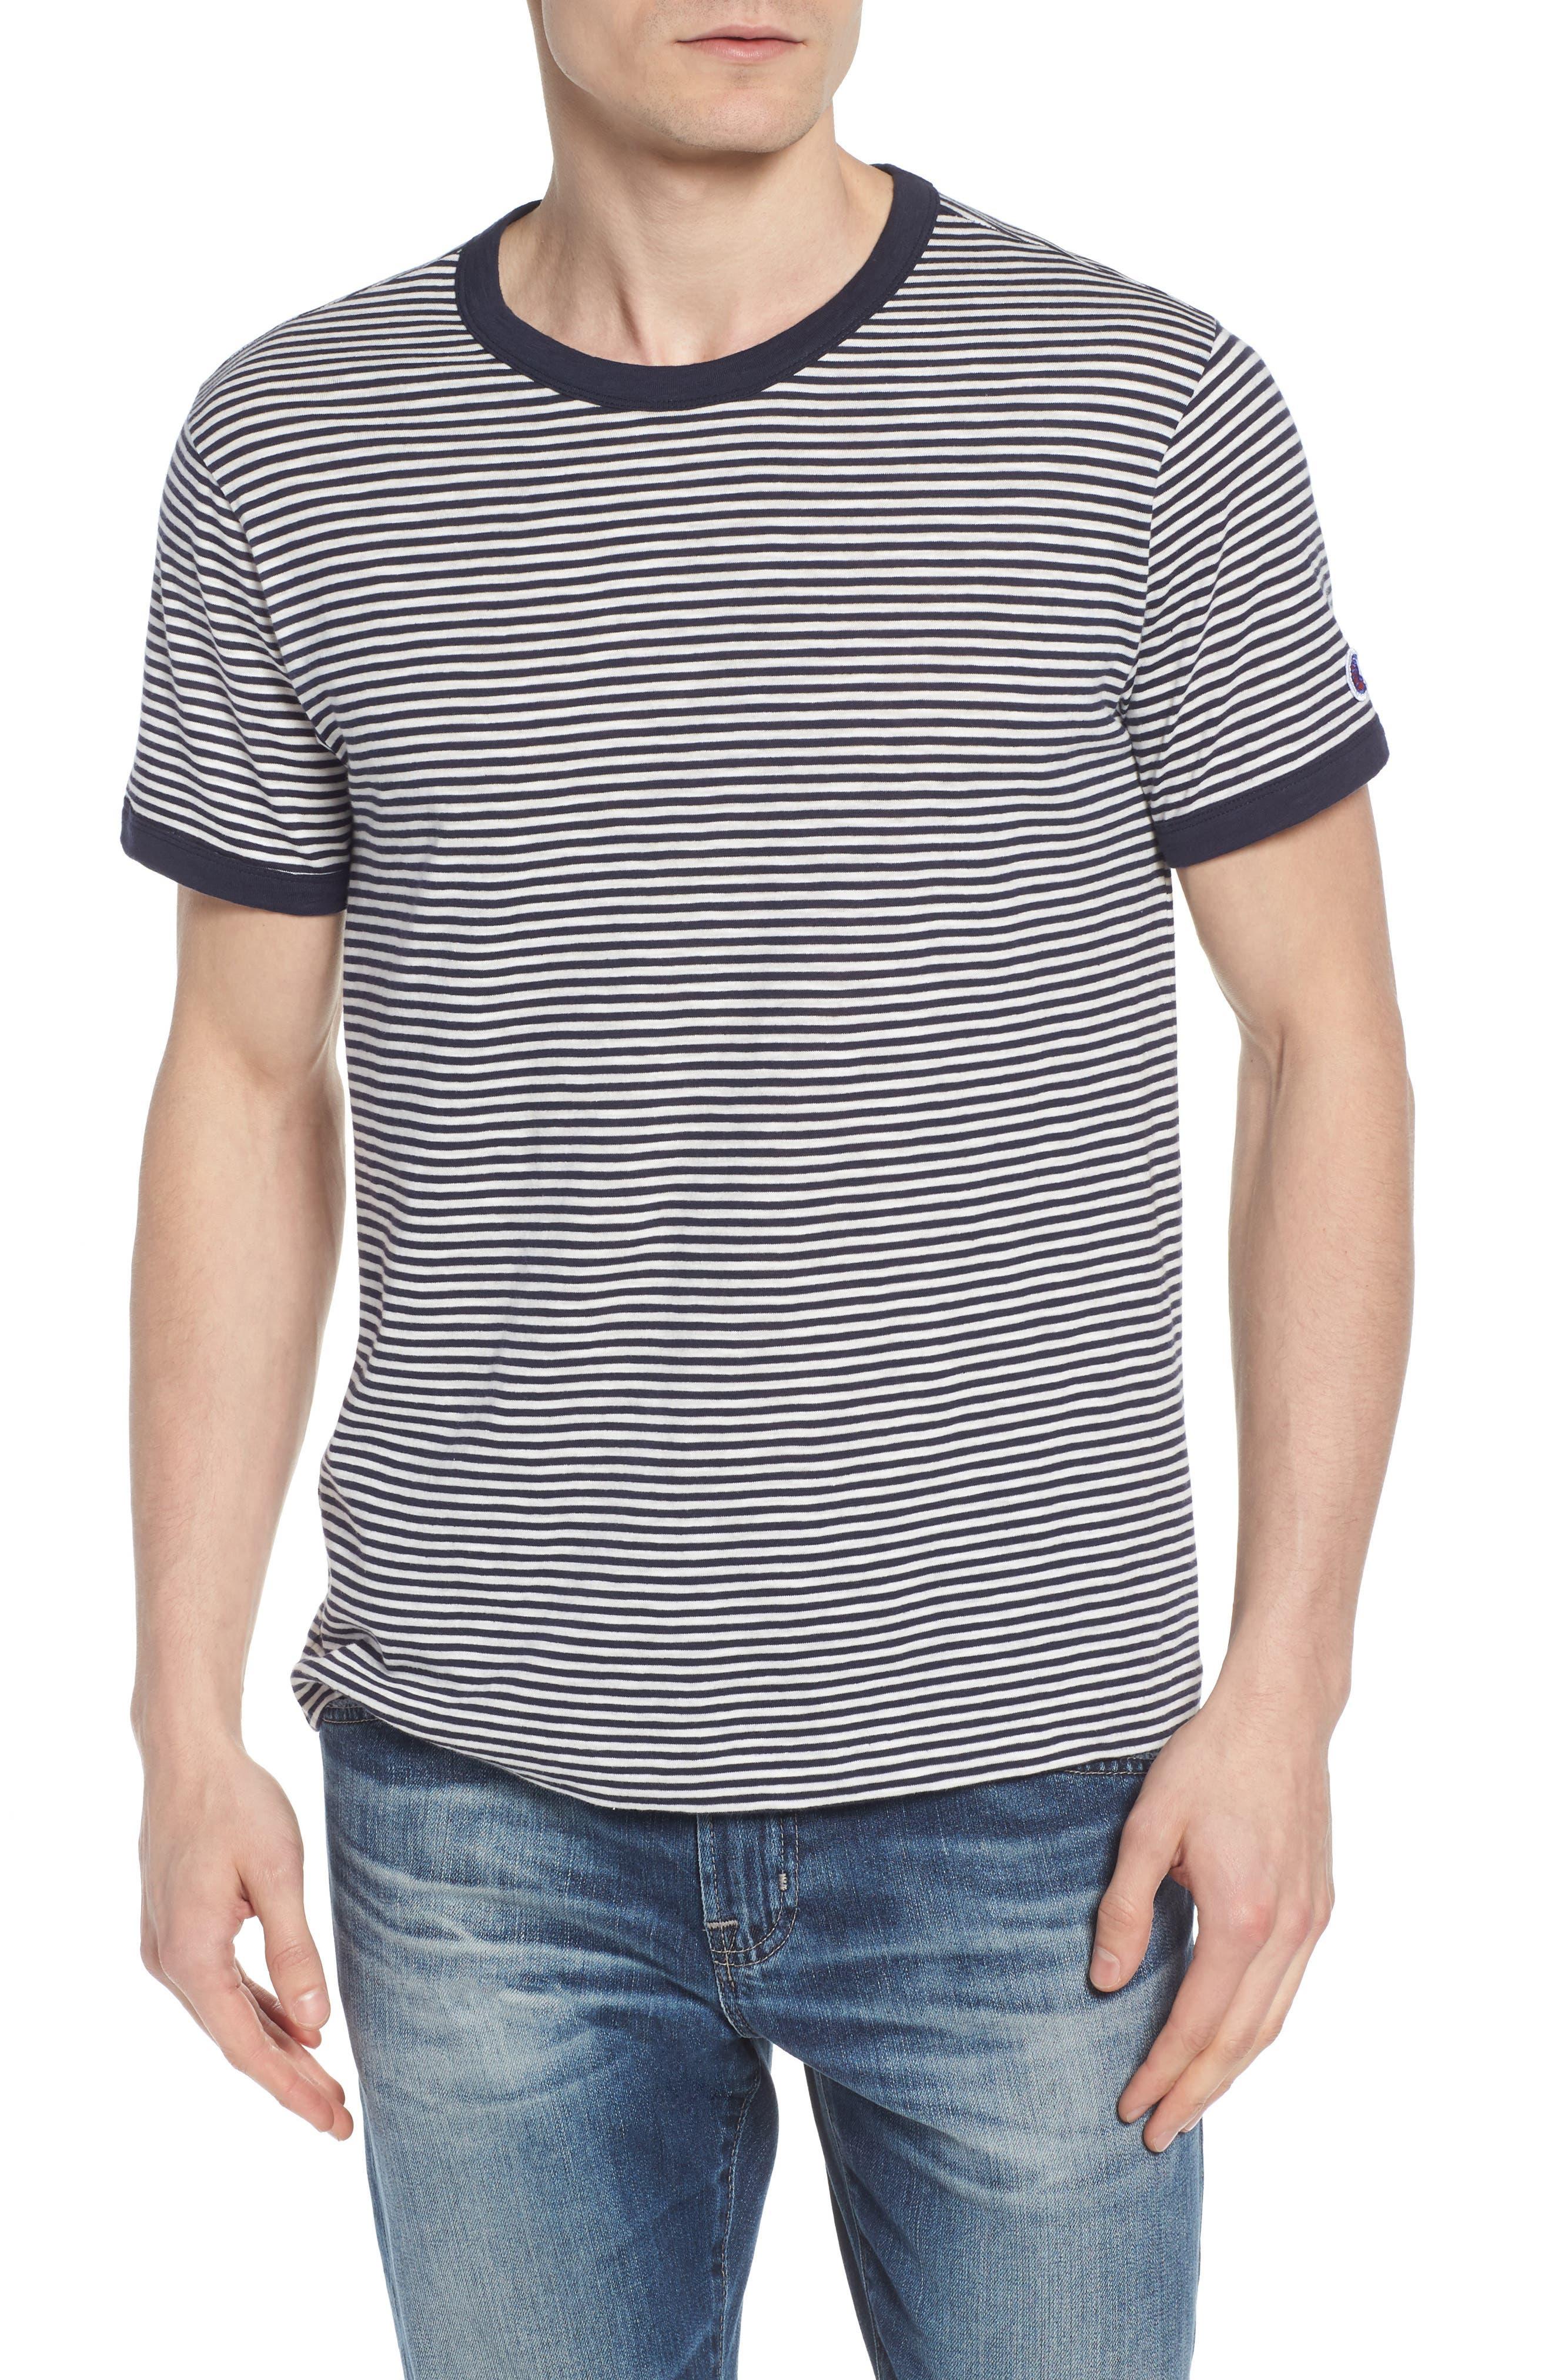 Todd Snyder + Champion Stripe T-Shirt